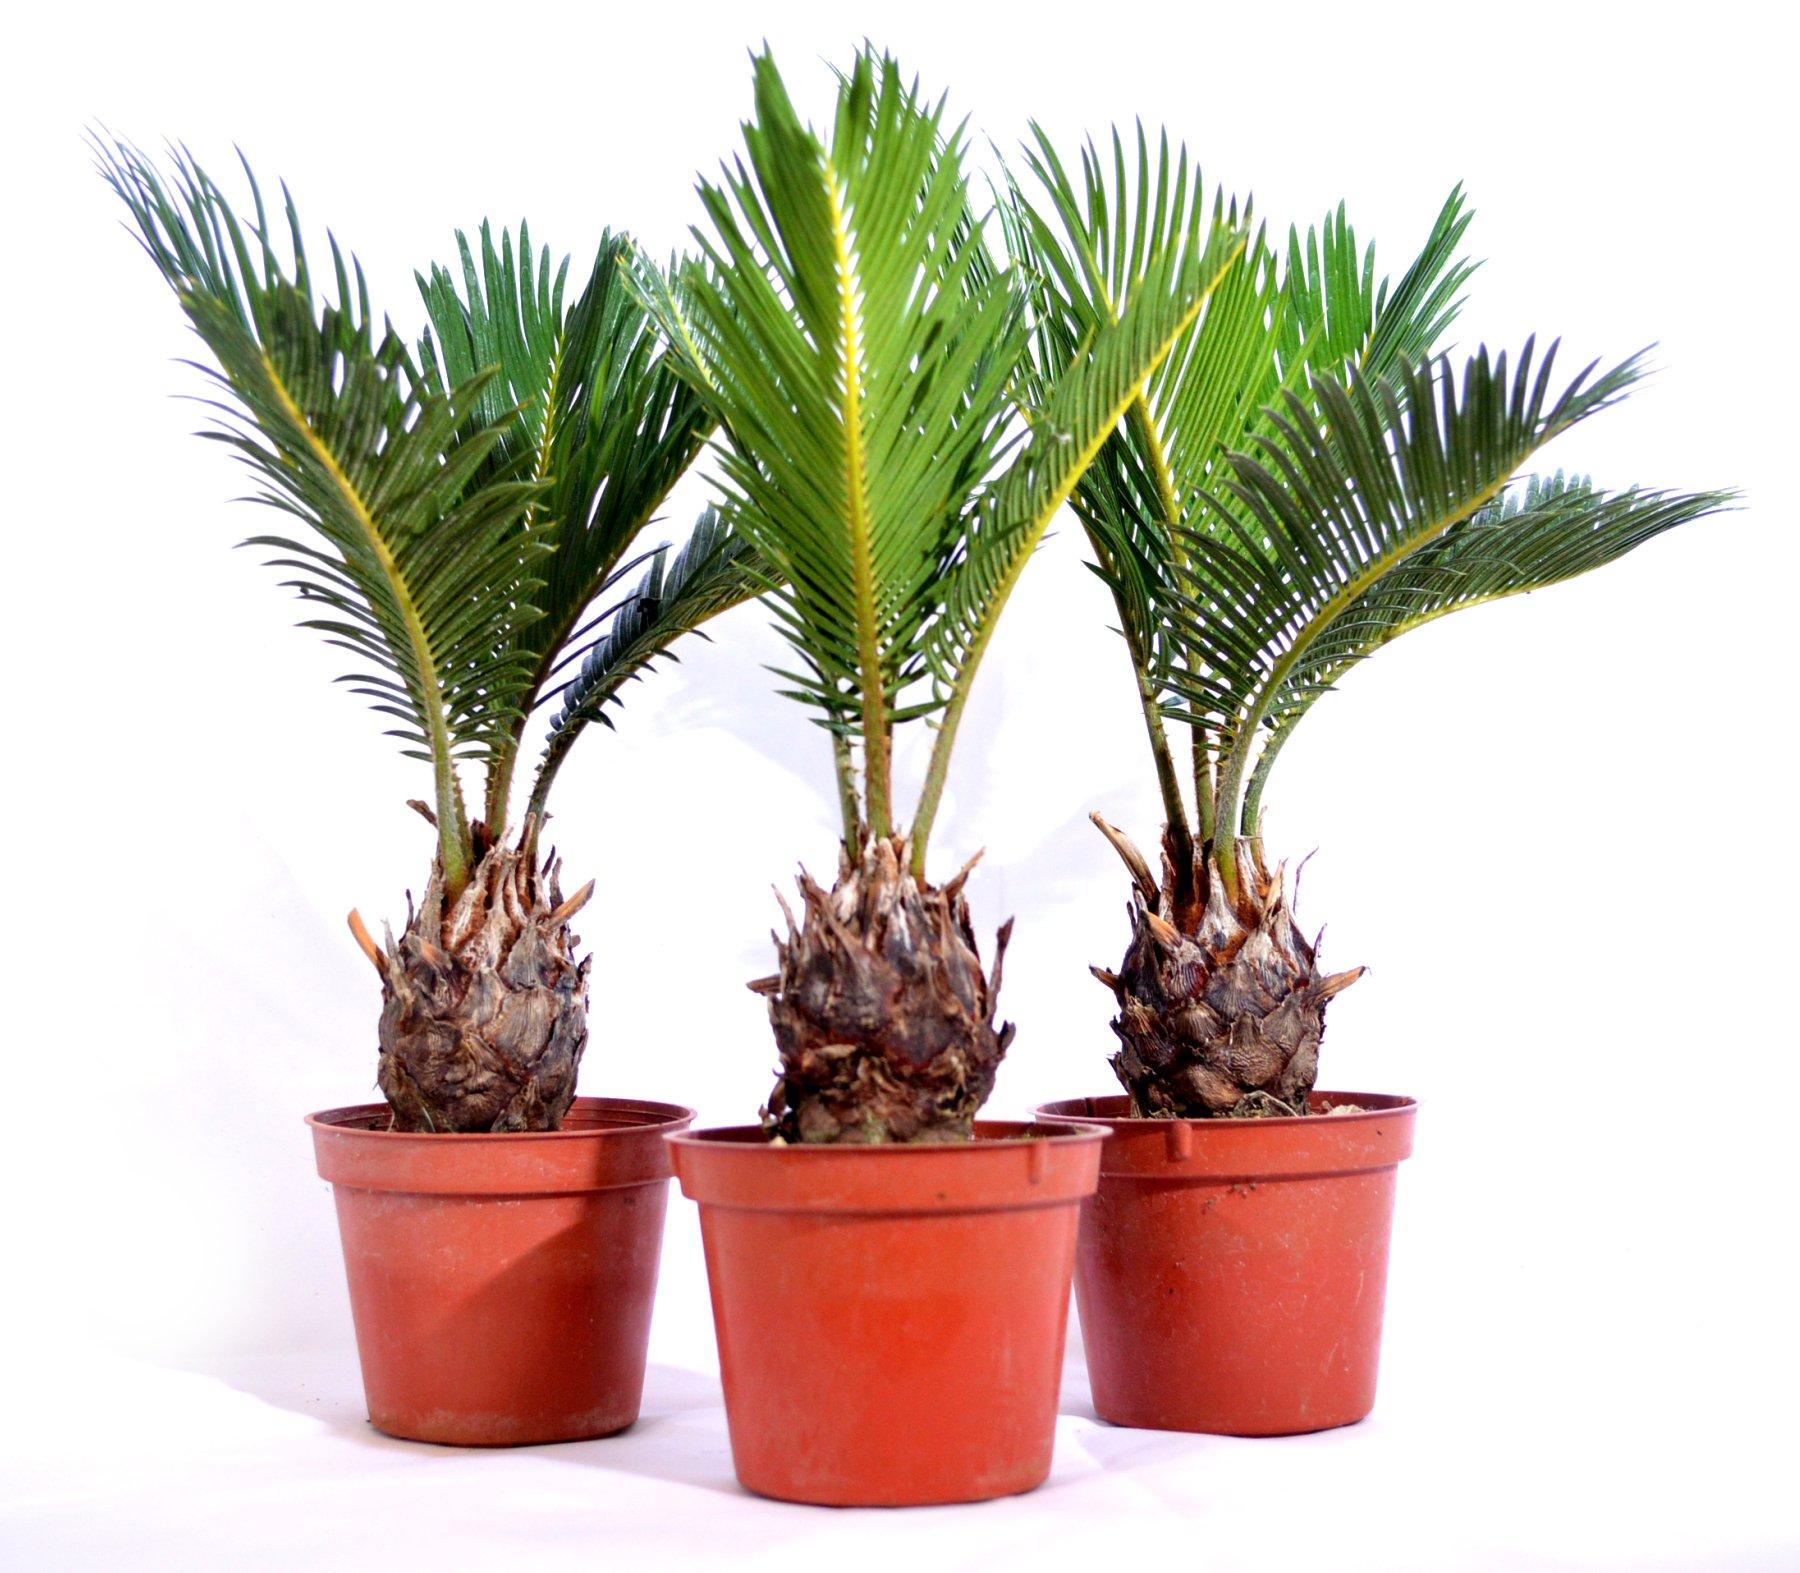 9Greenbox Japanese Sago Palm, Cycas Revoluta, 15.9 Ounce (Pack of 3)